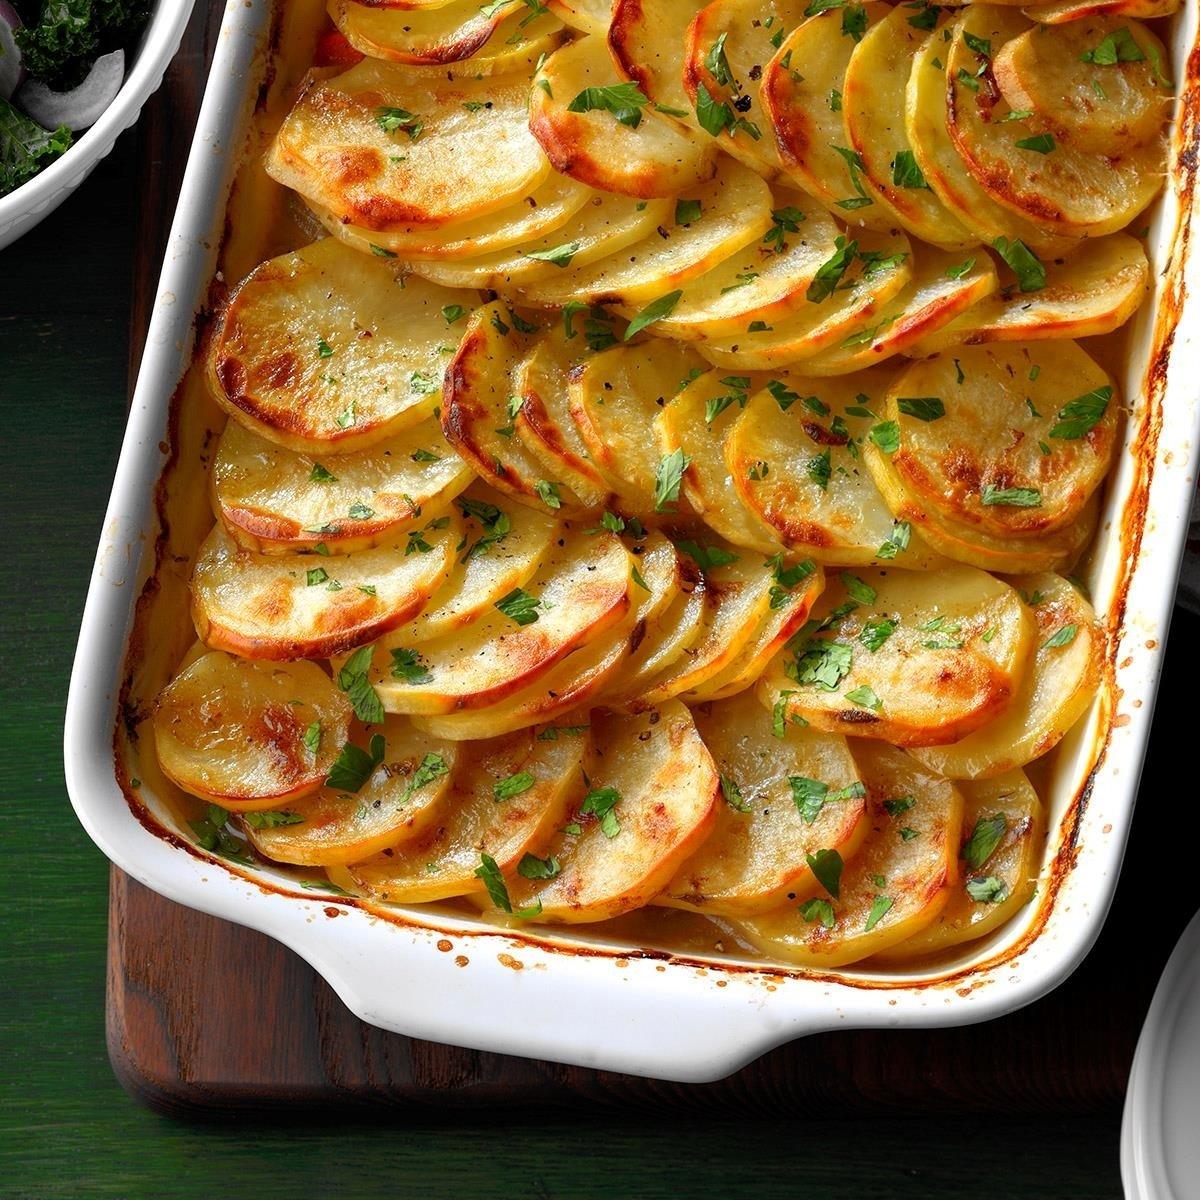 10 Trendy Simple Christmas Eve Dinner Ideas new england lamb bake recipe taste of home 2020